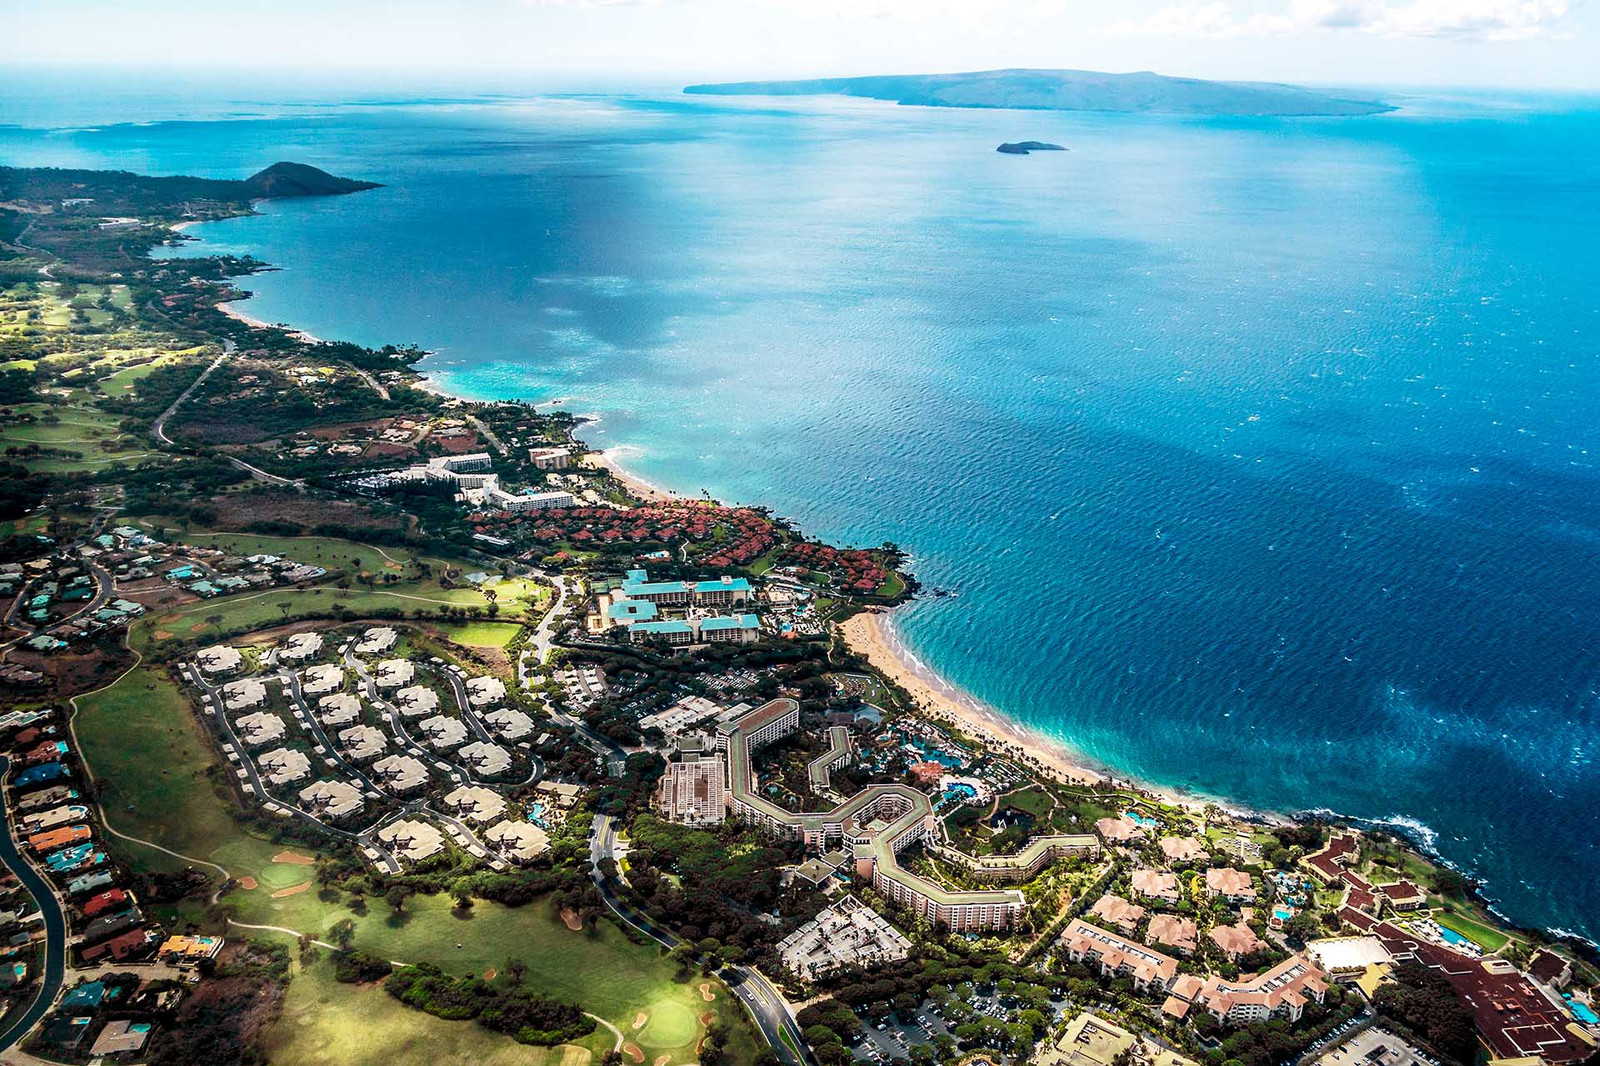 WillGoTo : Hawaii (USA), Maui Beaches, Hawaii